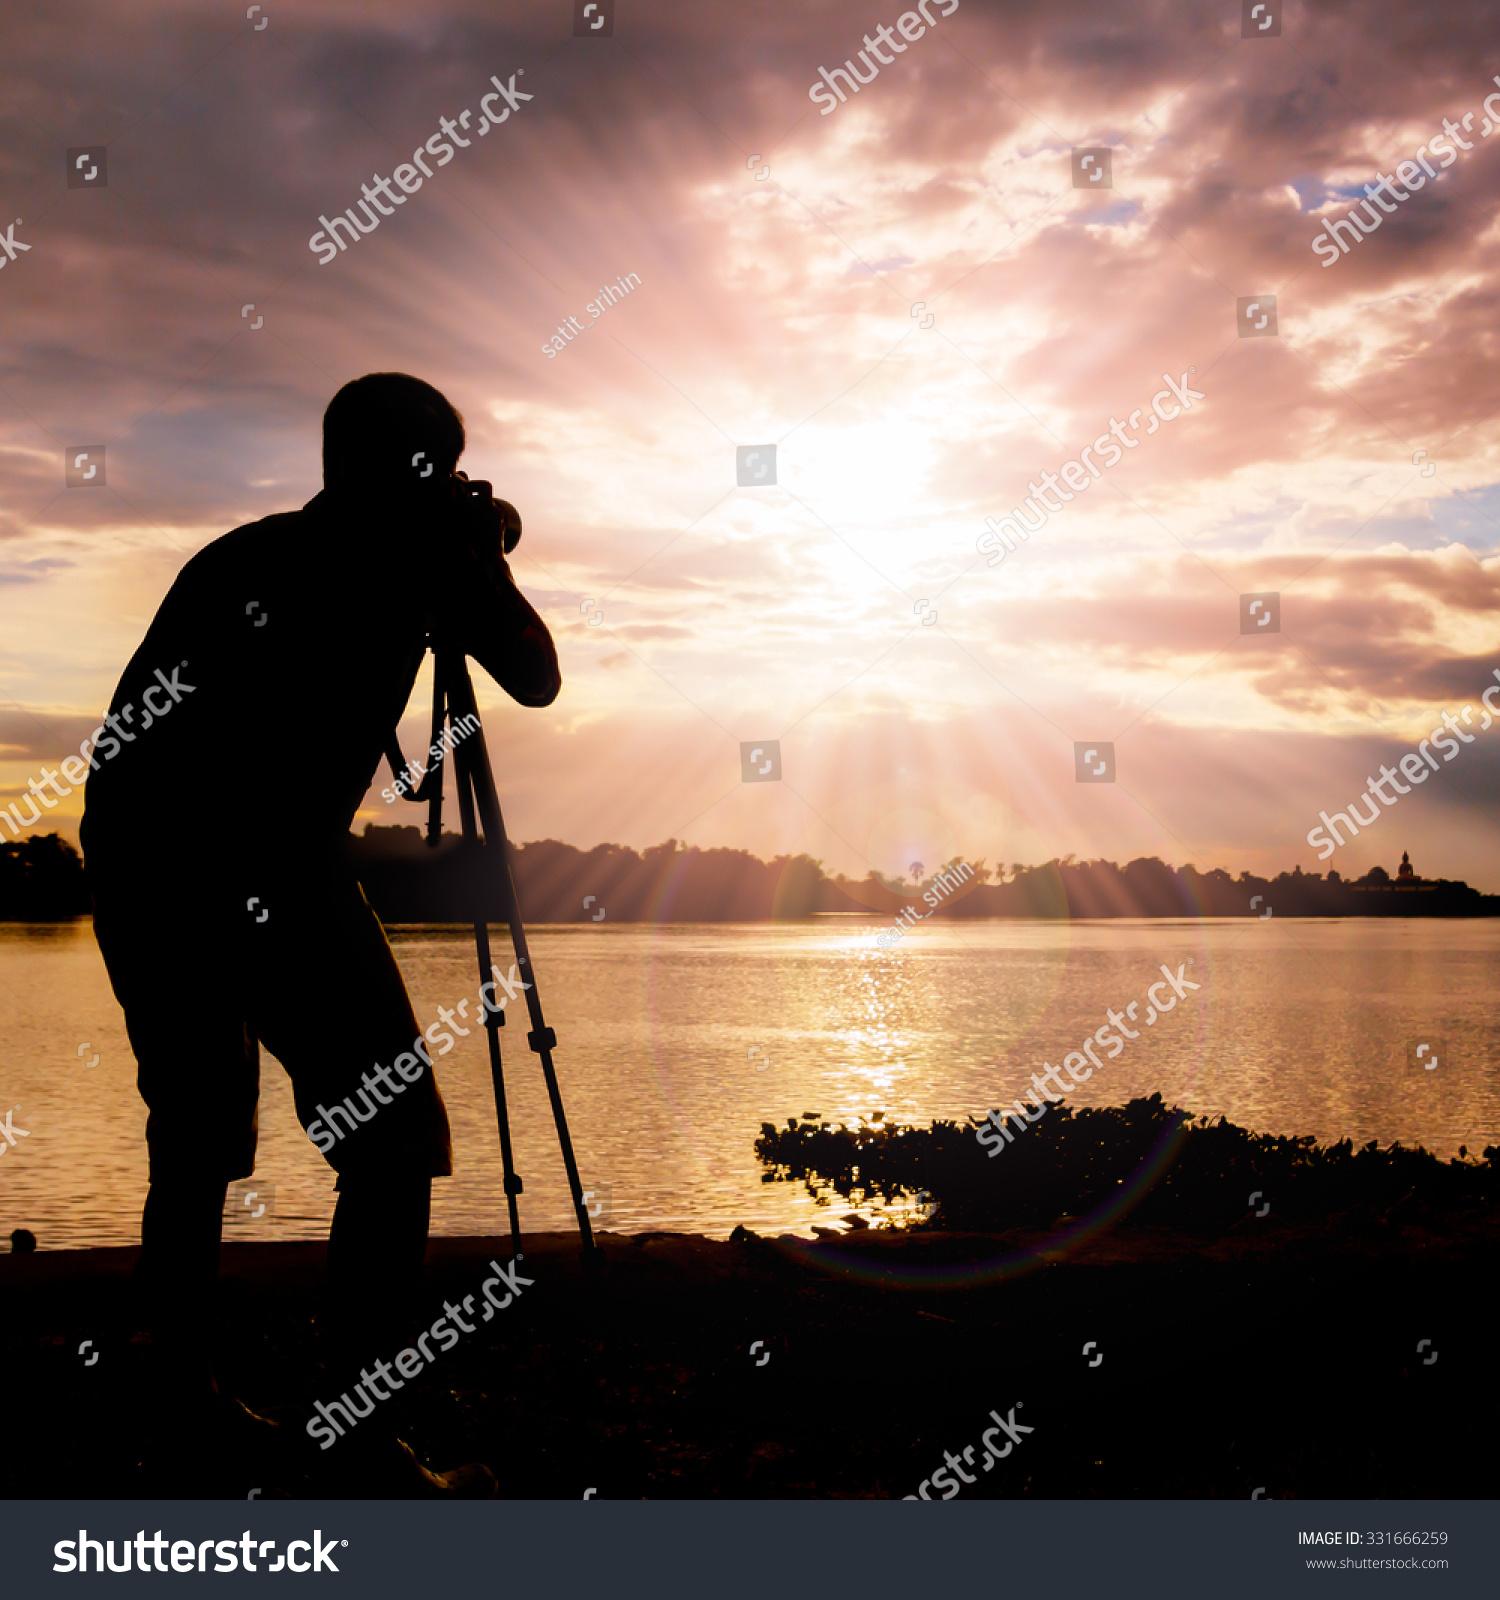 Silhouette grapher Taking Sunset Sunray Stock